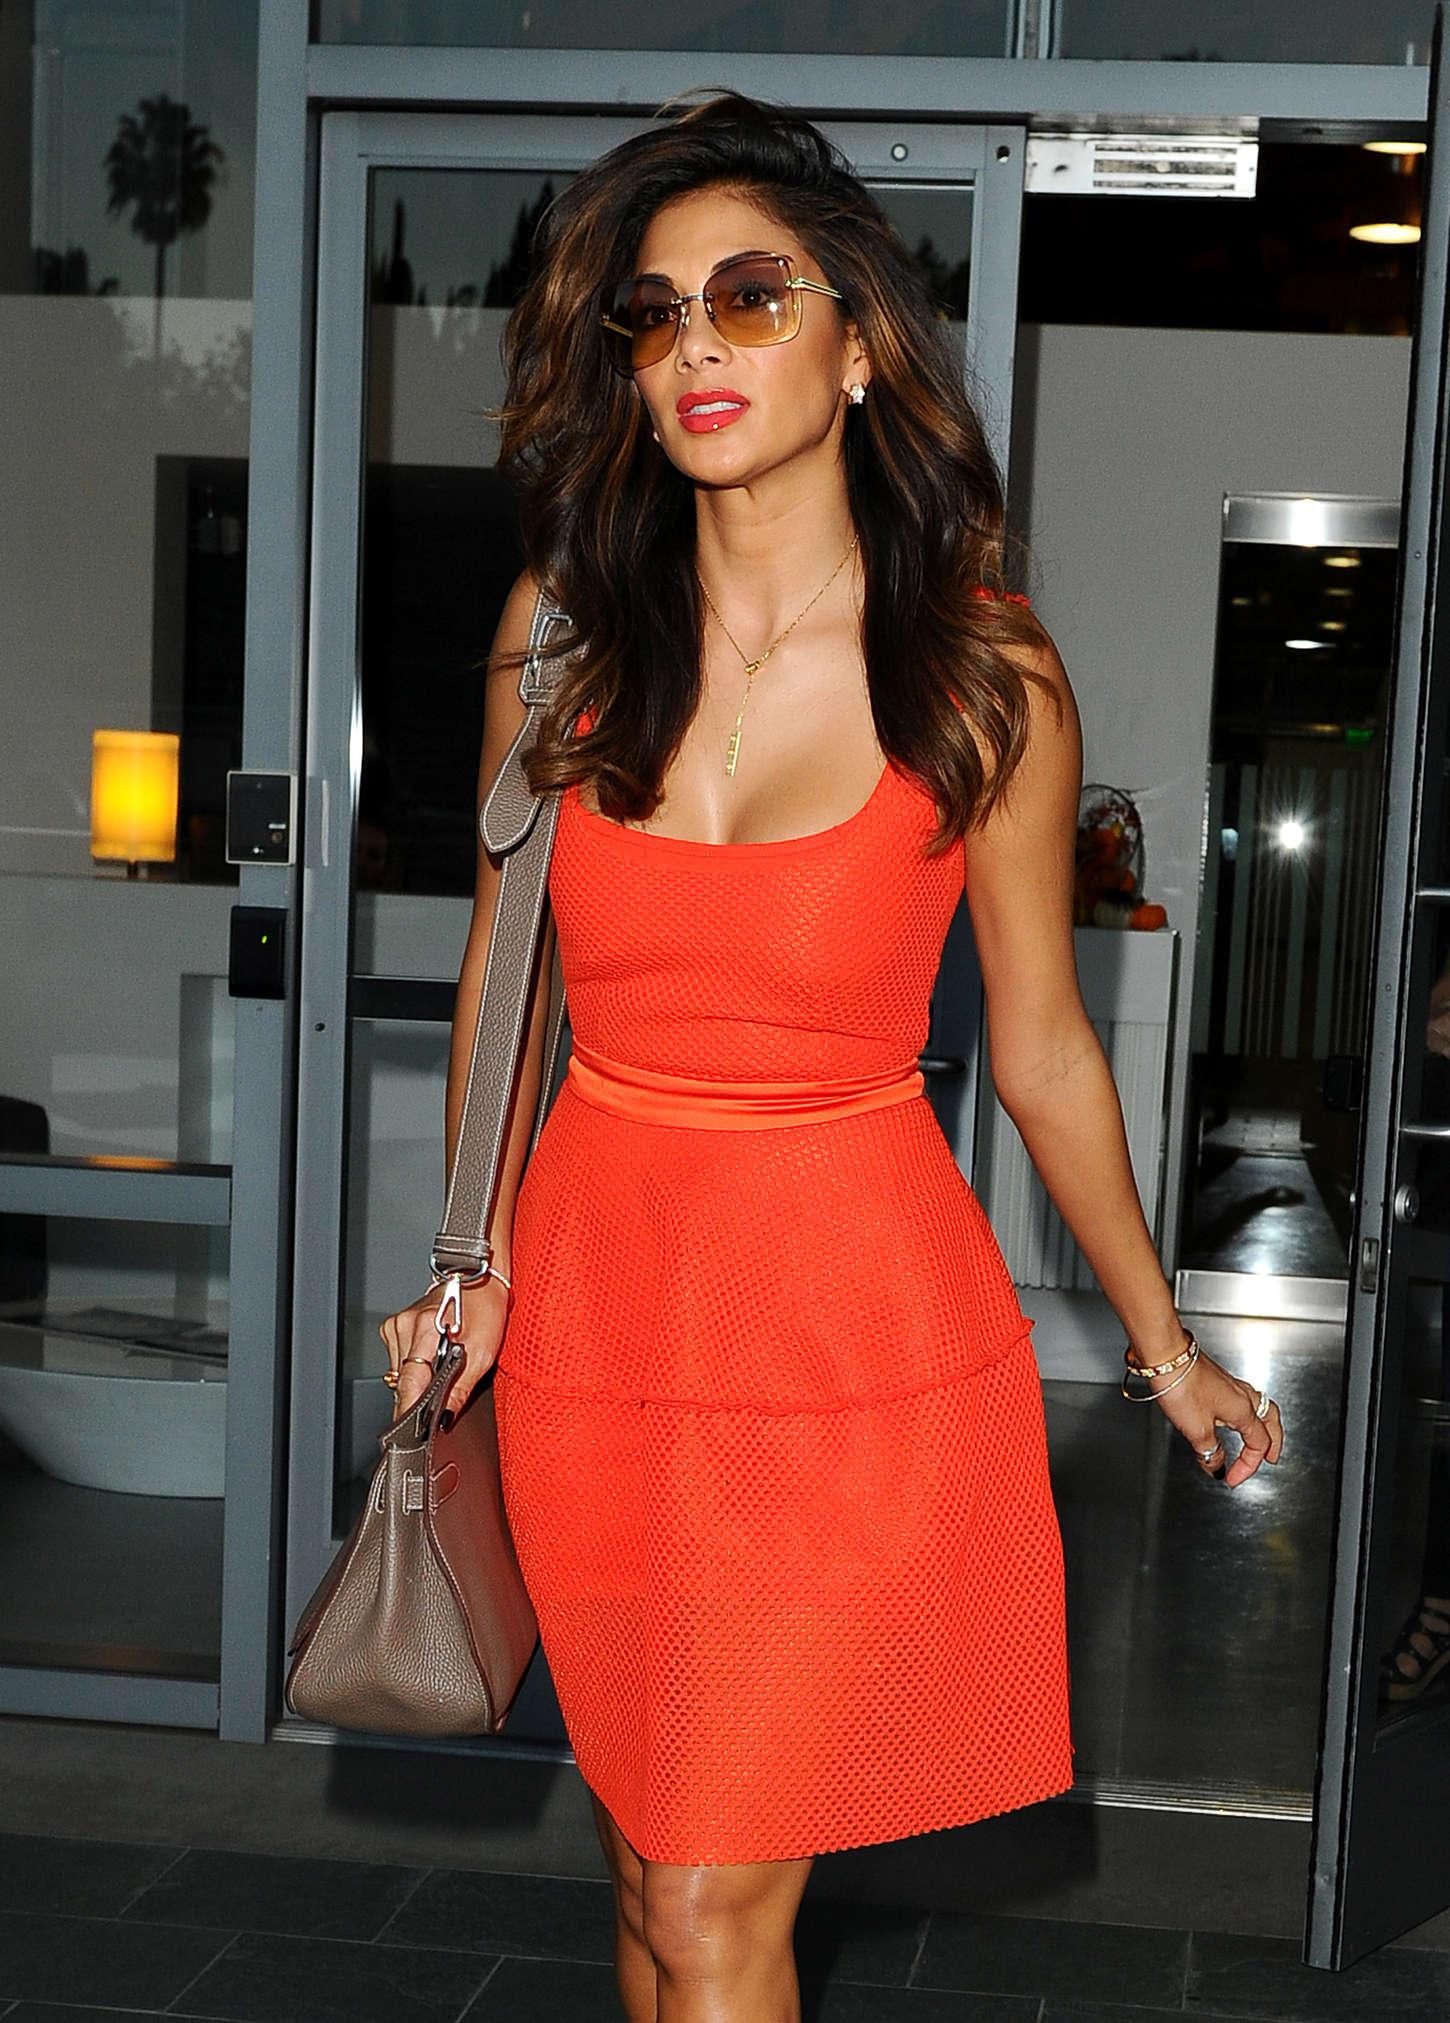 Nicole Scherzinger in Mini Dress  - Leaving The Live Nation Offices in LA